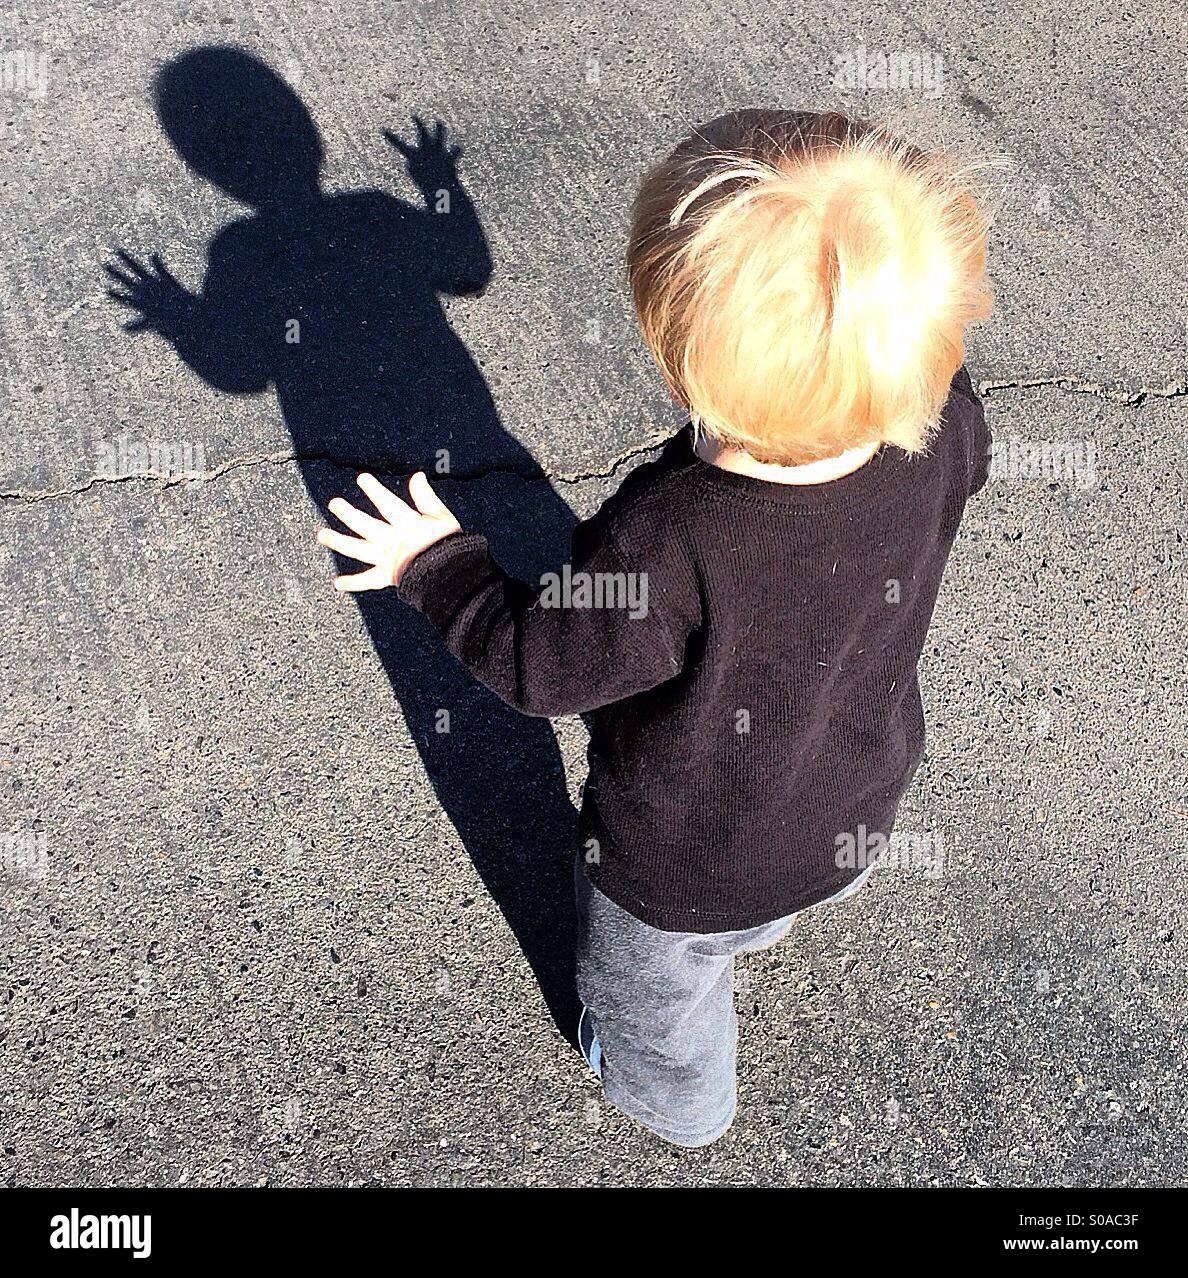 Shadow Dance Immagini Stock